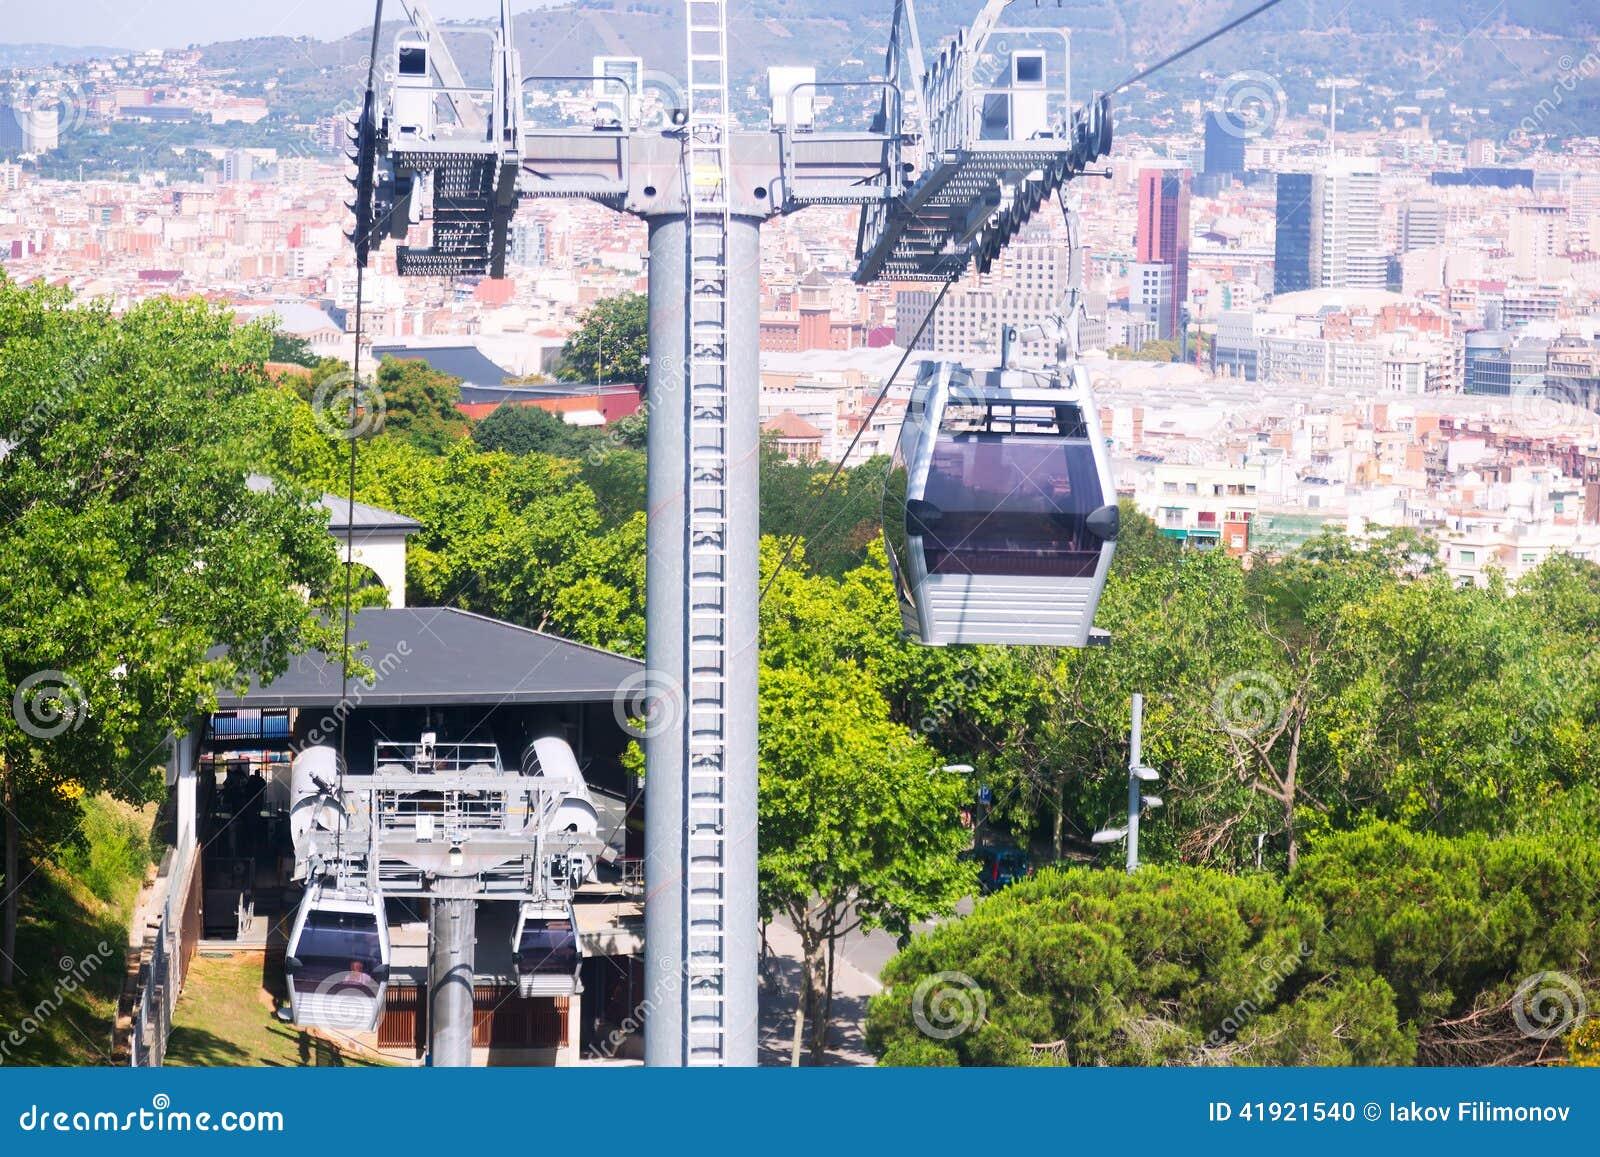 Teleférico de Montjuic en Barcelona, España